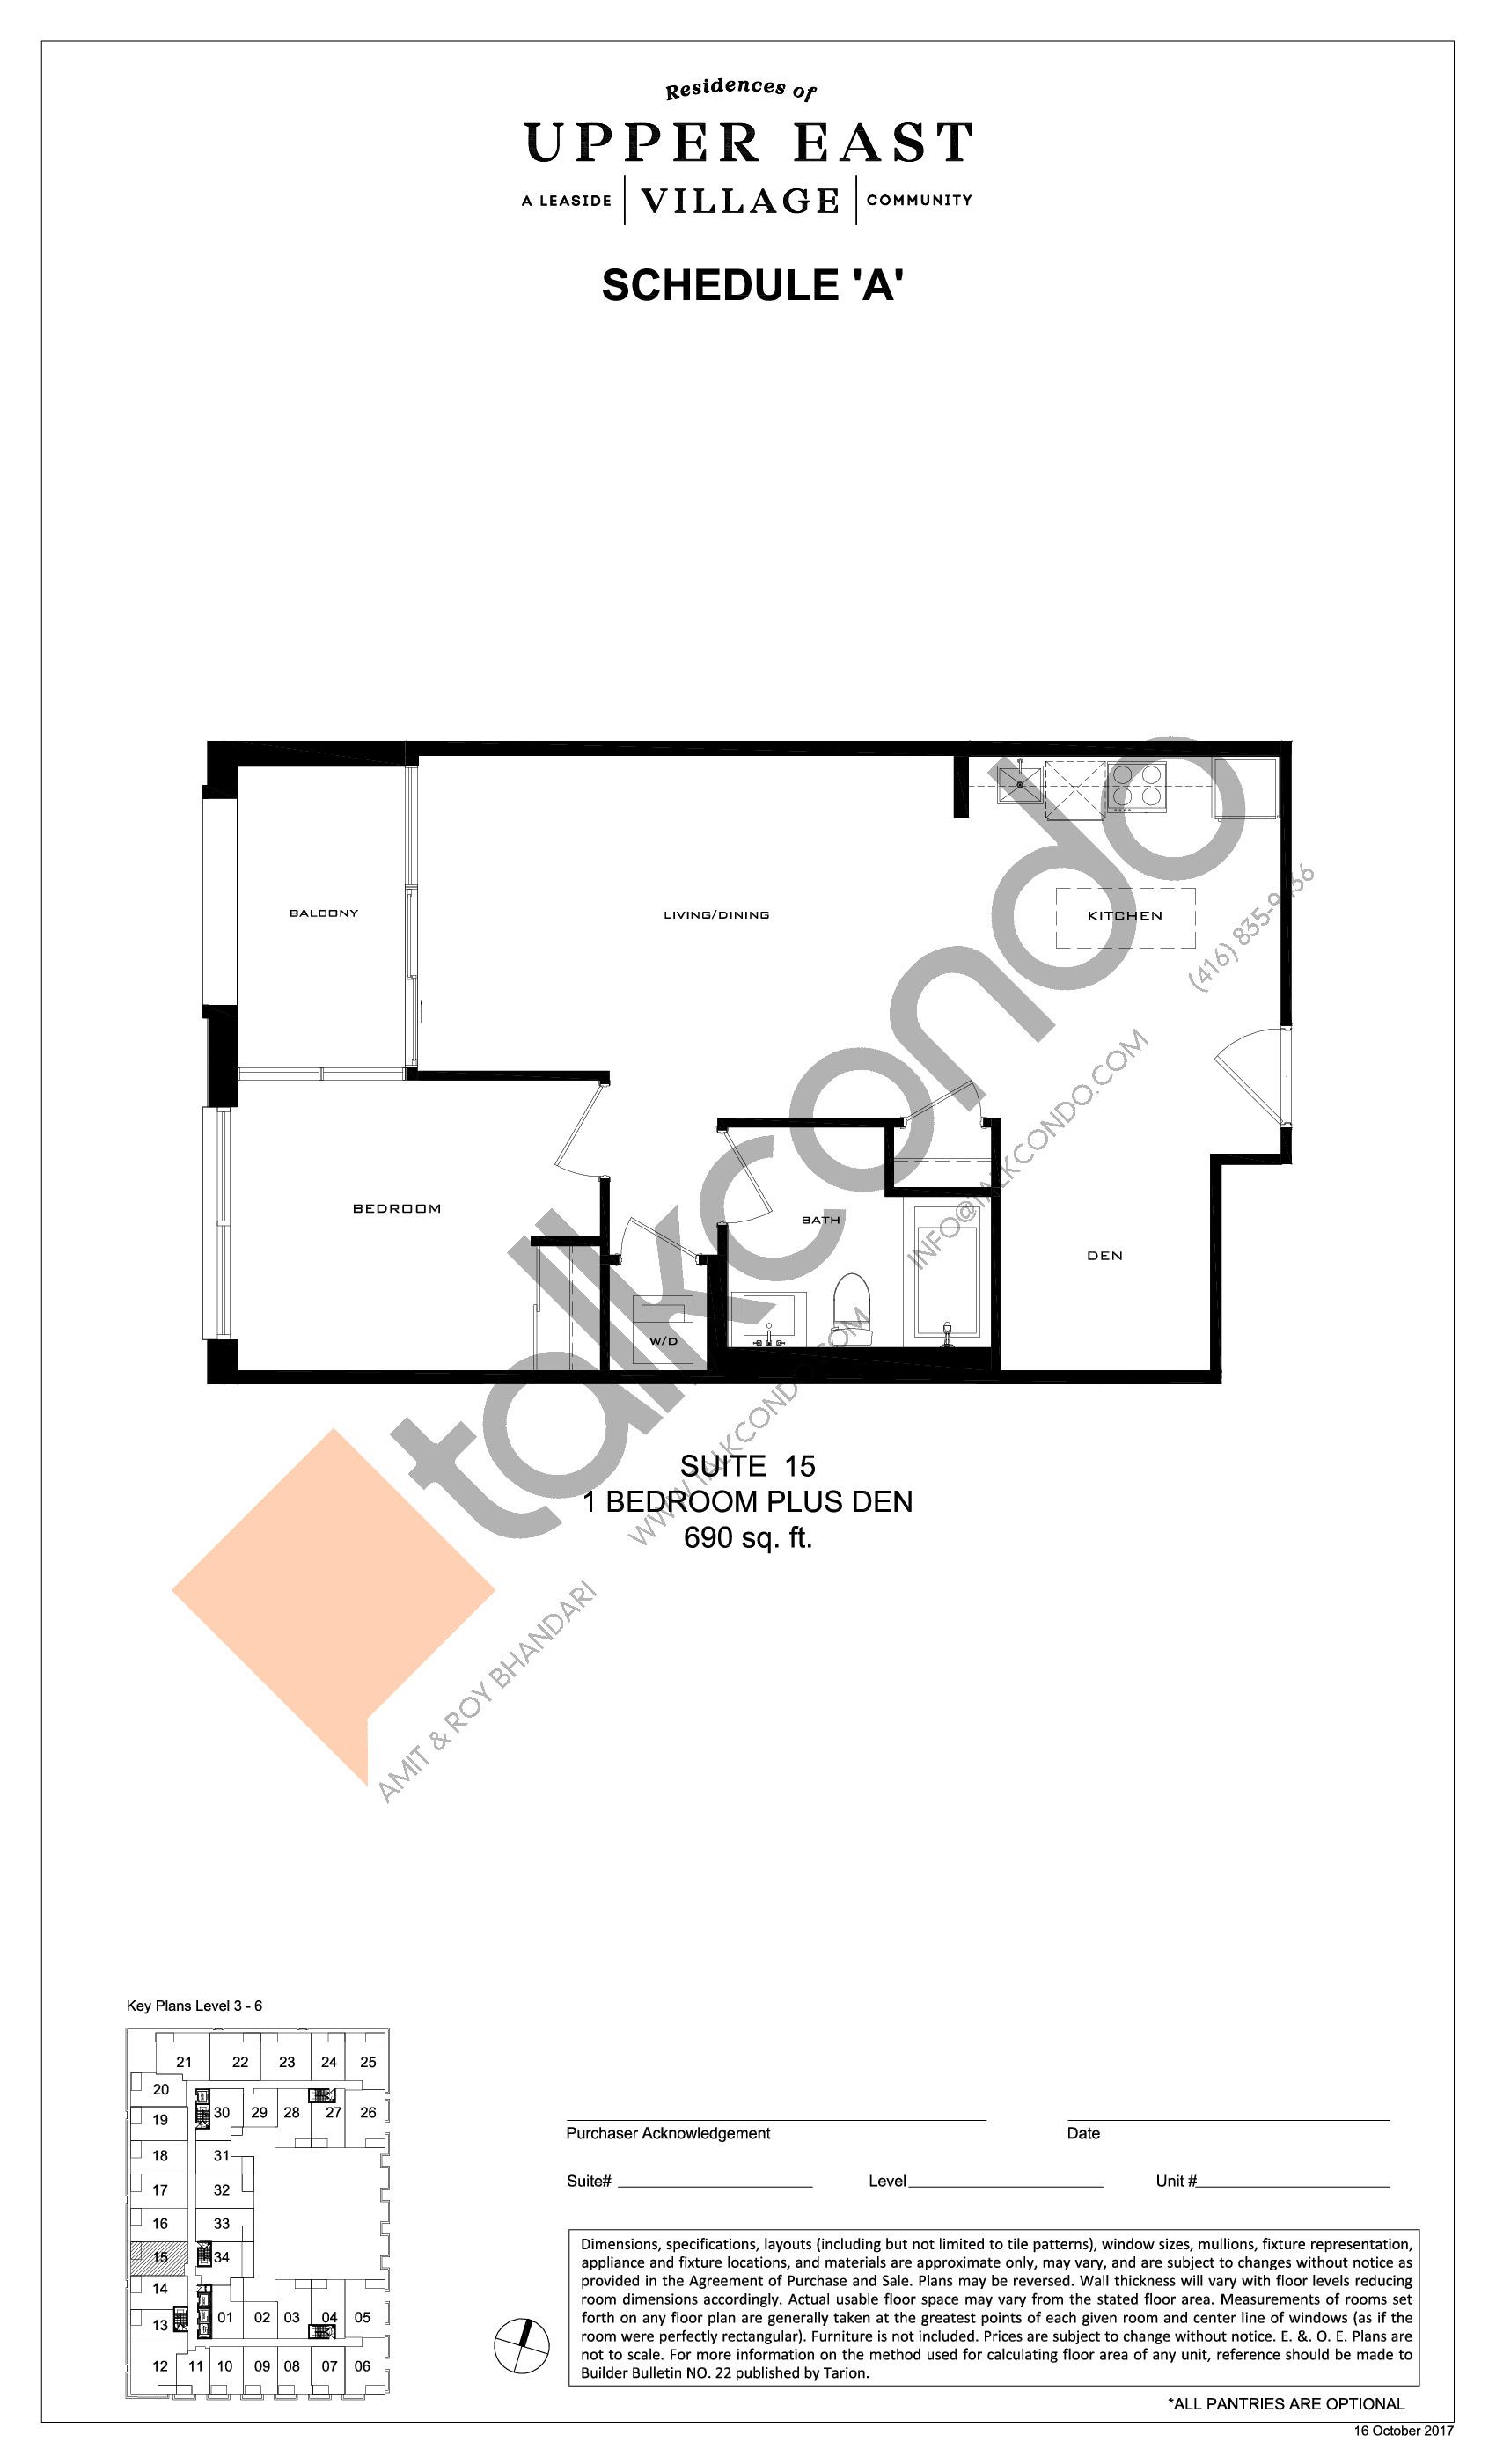 Suite 15 Floor Plan at Upper East Village Condos - 690 sq.ft